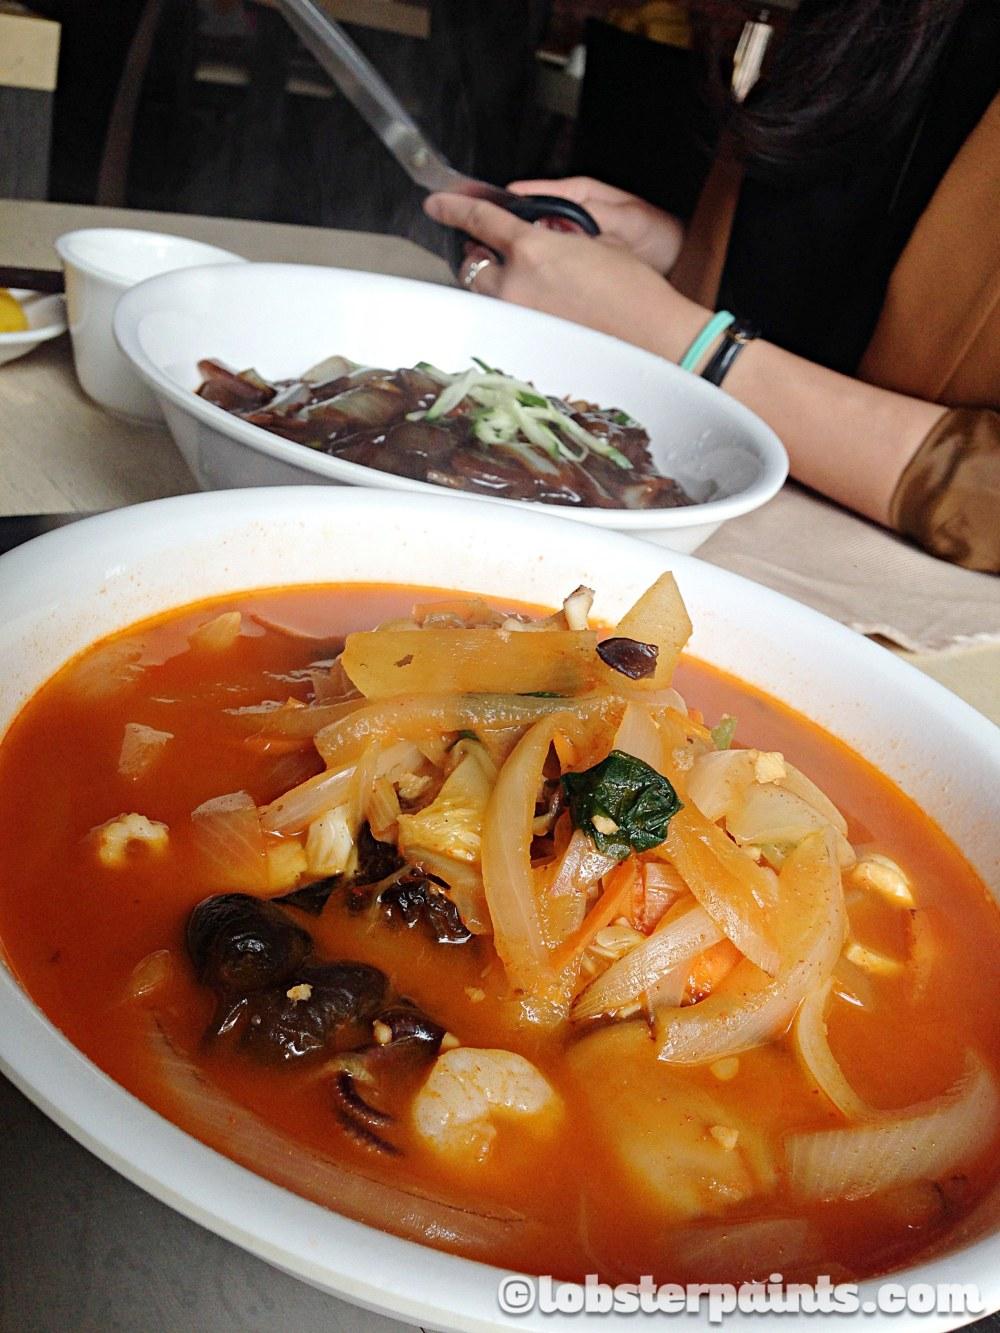 1 Oct 2014: Breakfast at Xing Chairo 씽차이로   Seoul, South Korea